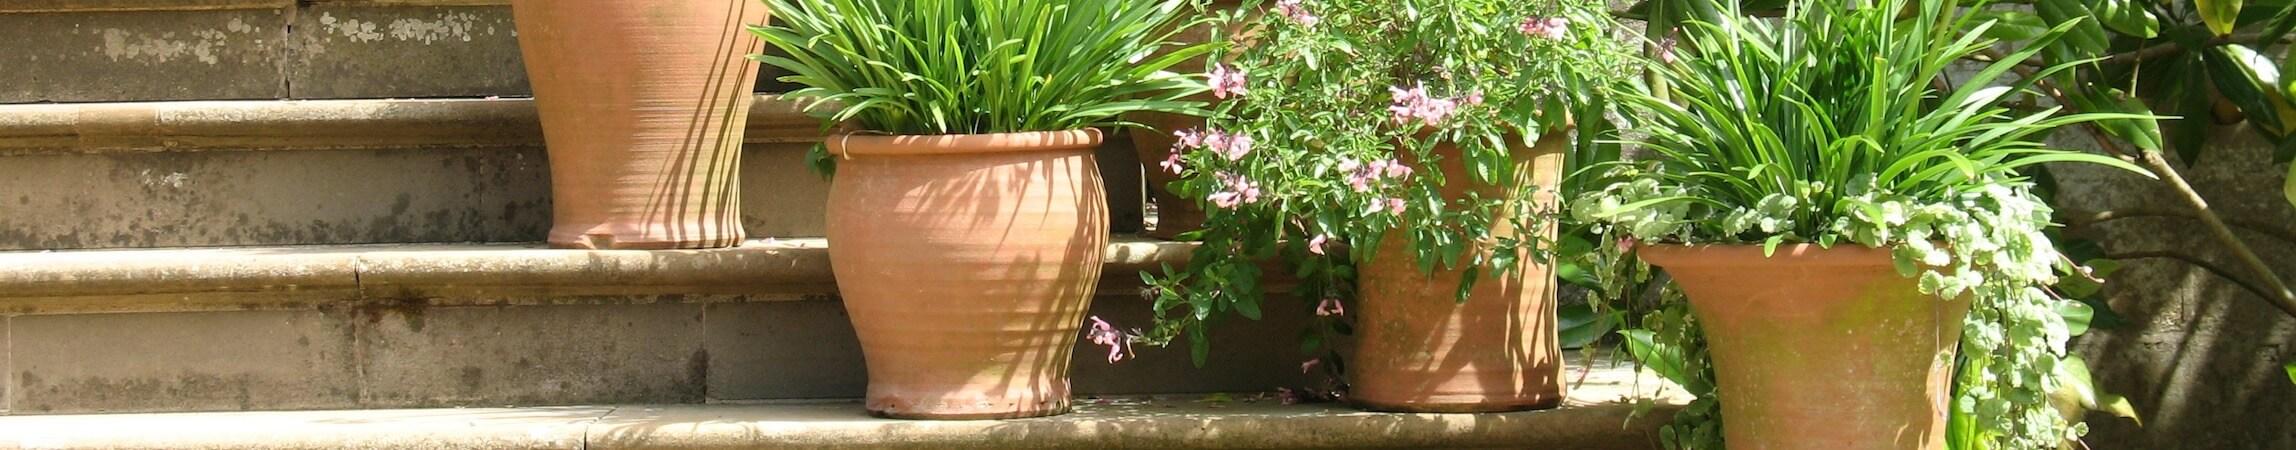 Gardening 11